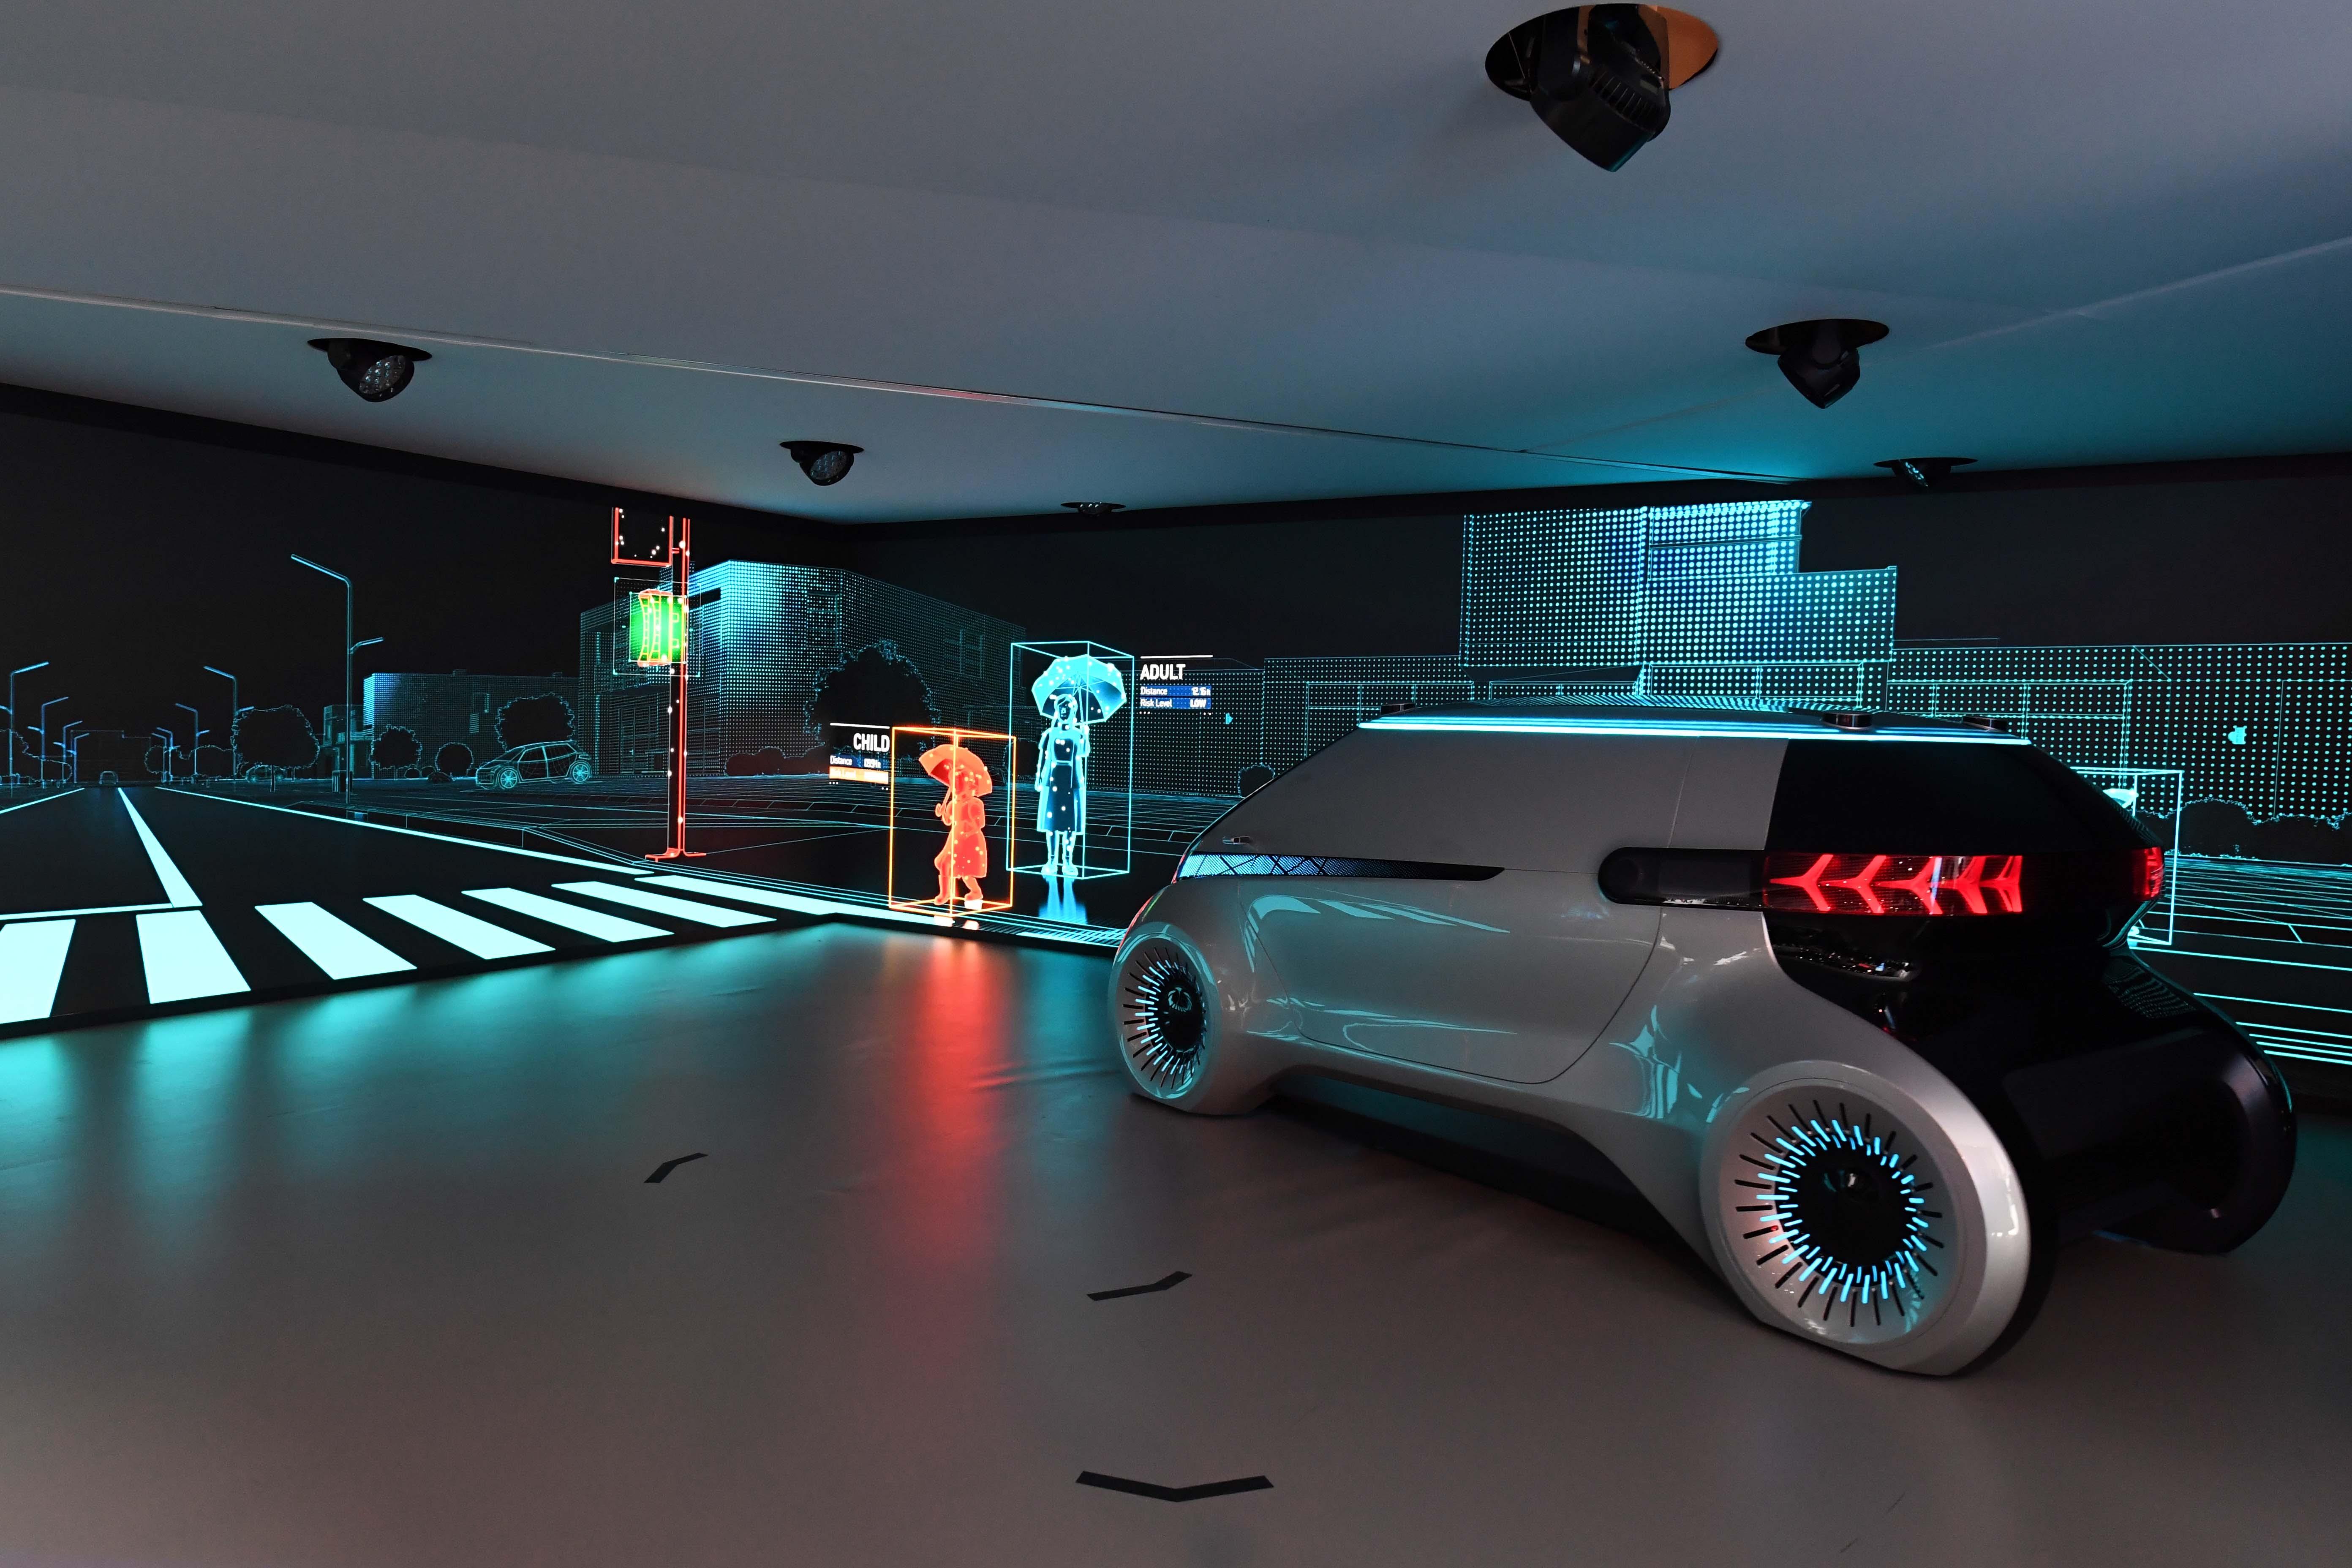 HYUNDAI MOBIS的通信照明概念赋予车灯更多的安全功能